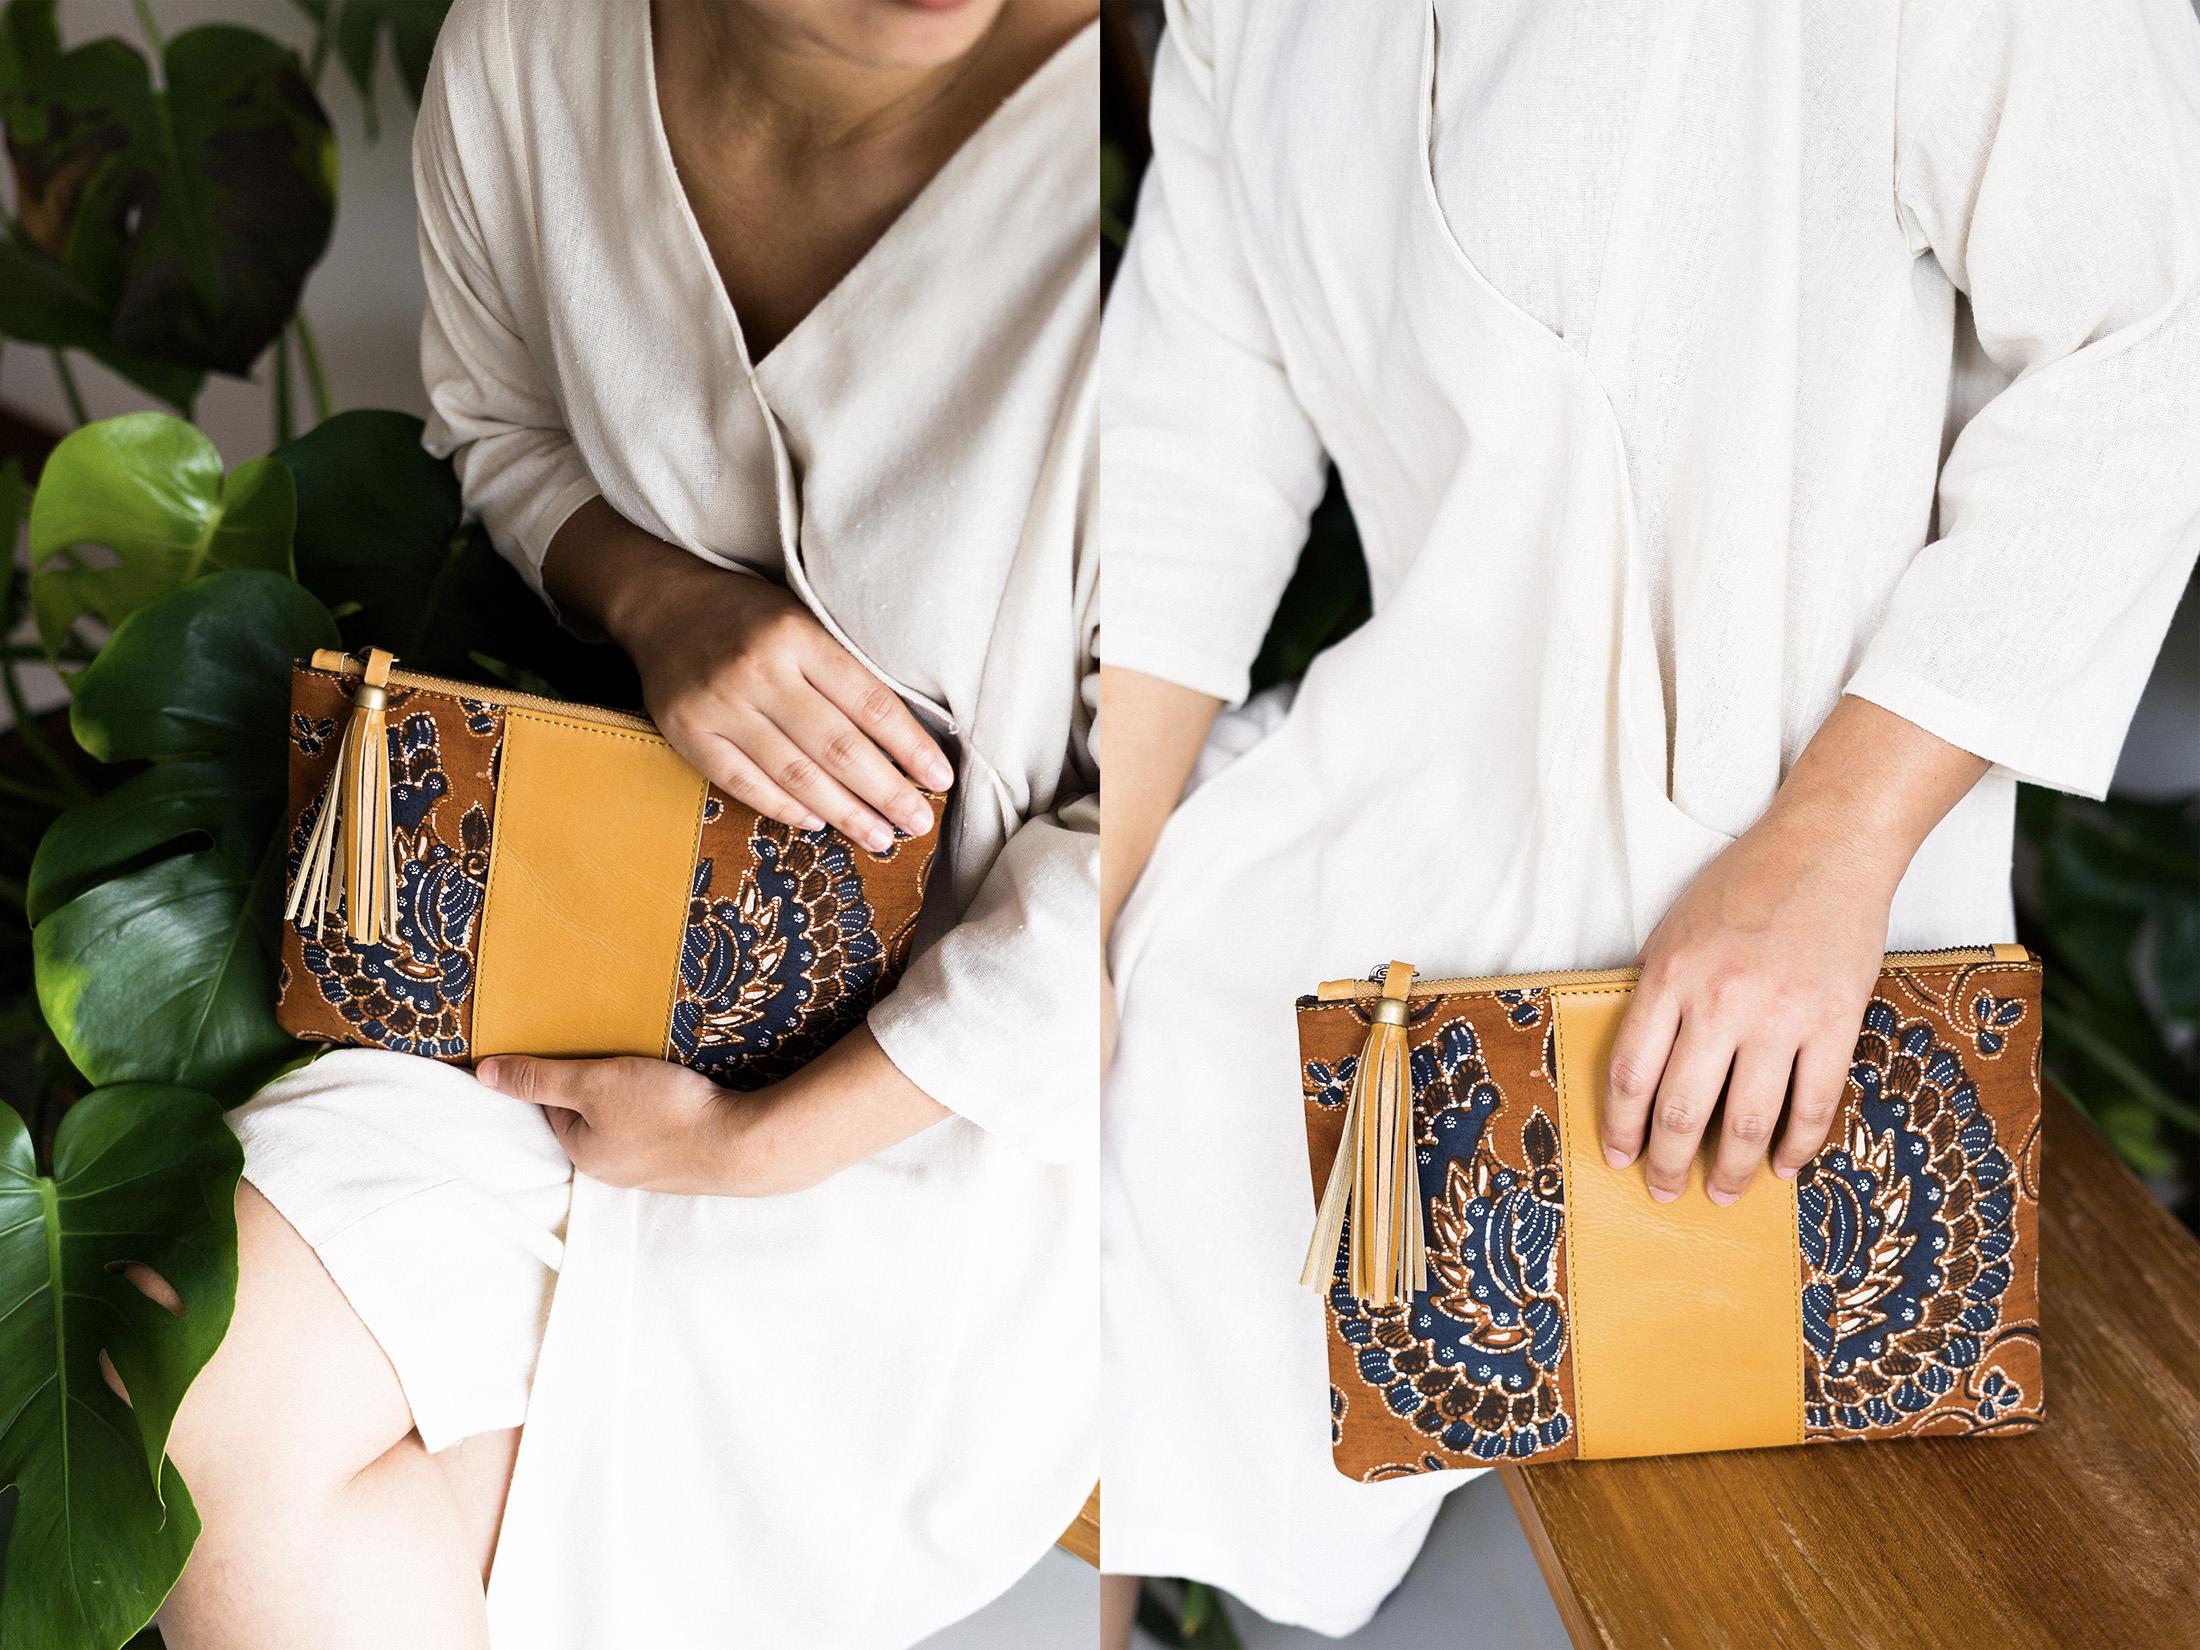 singapore-photographer-gypsied-batik-clutch-layar-indra-4.jpg